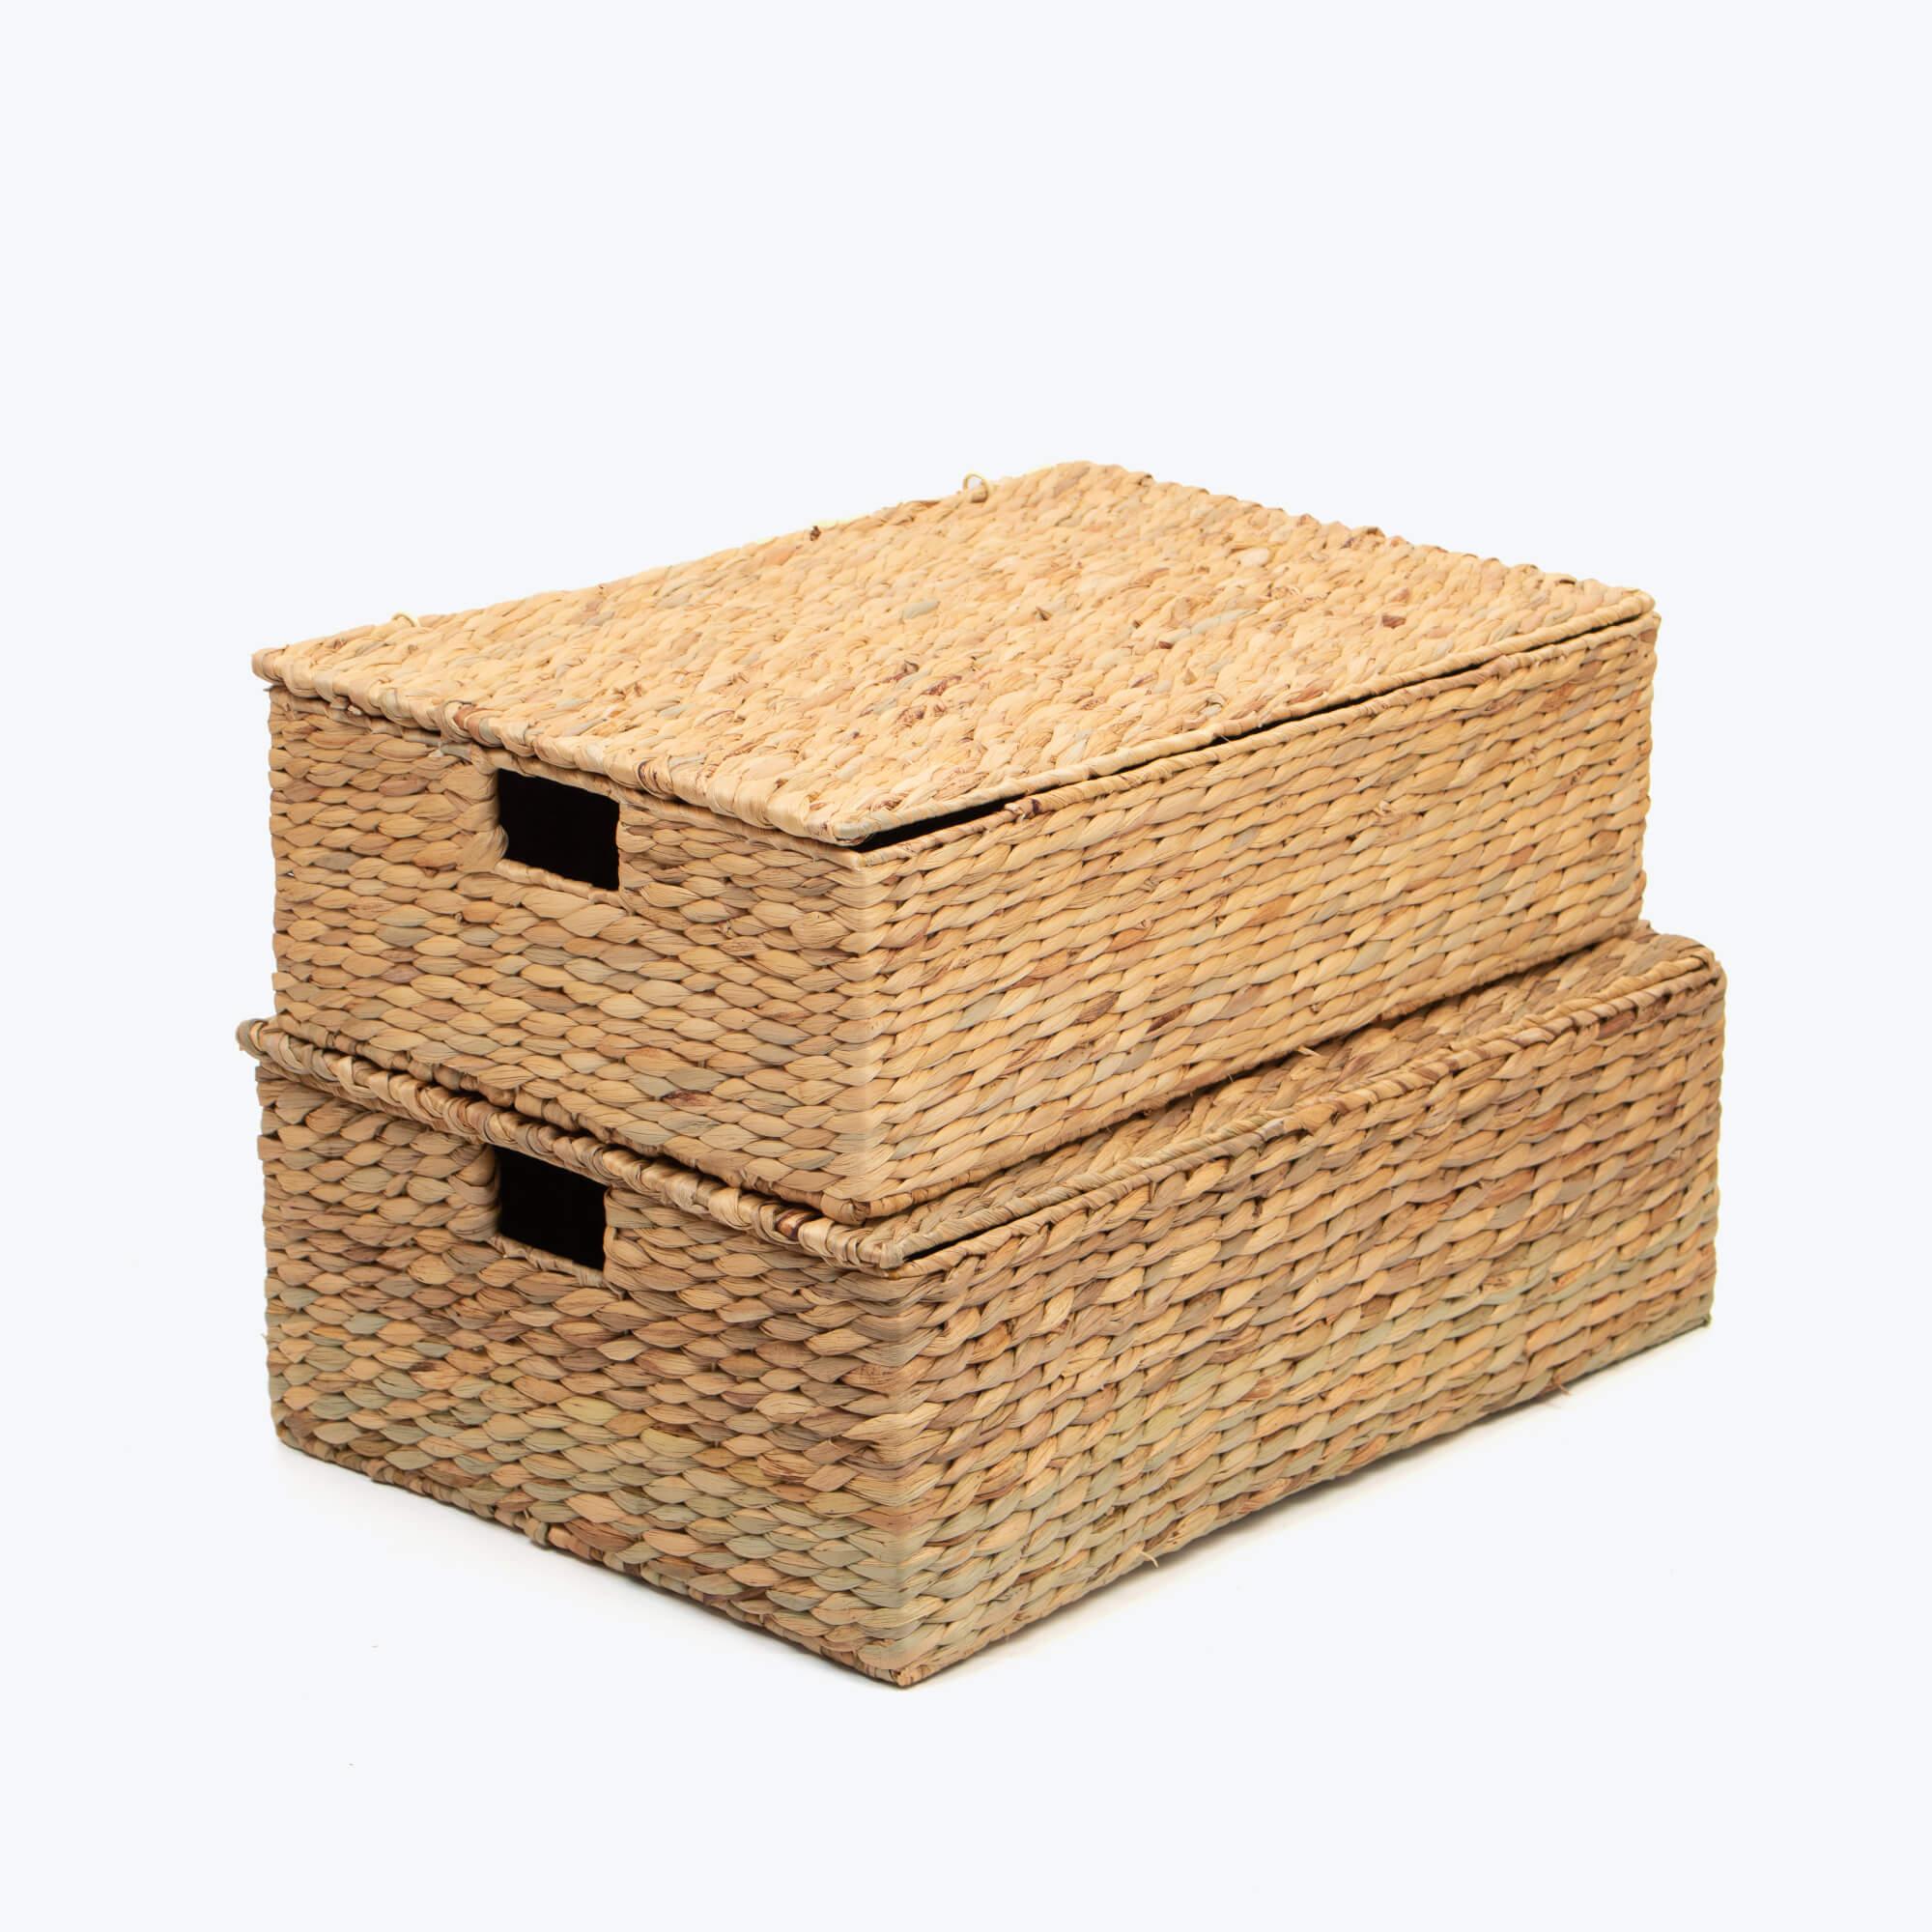 eco-friendly rectangular water hyacinth storage basket with lid